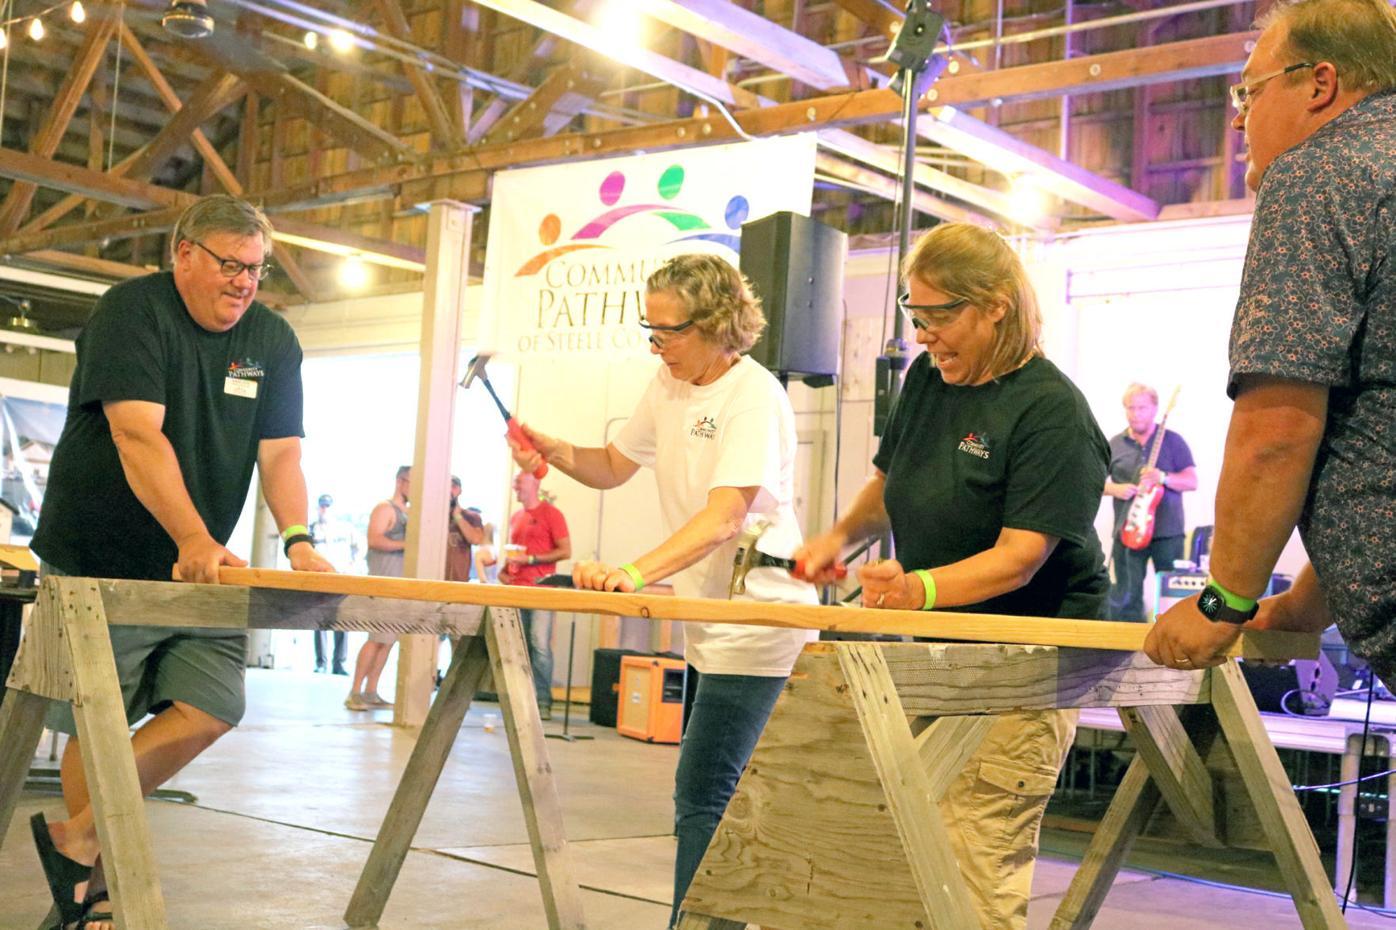 Community Pathways fundraiser